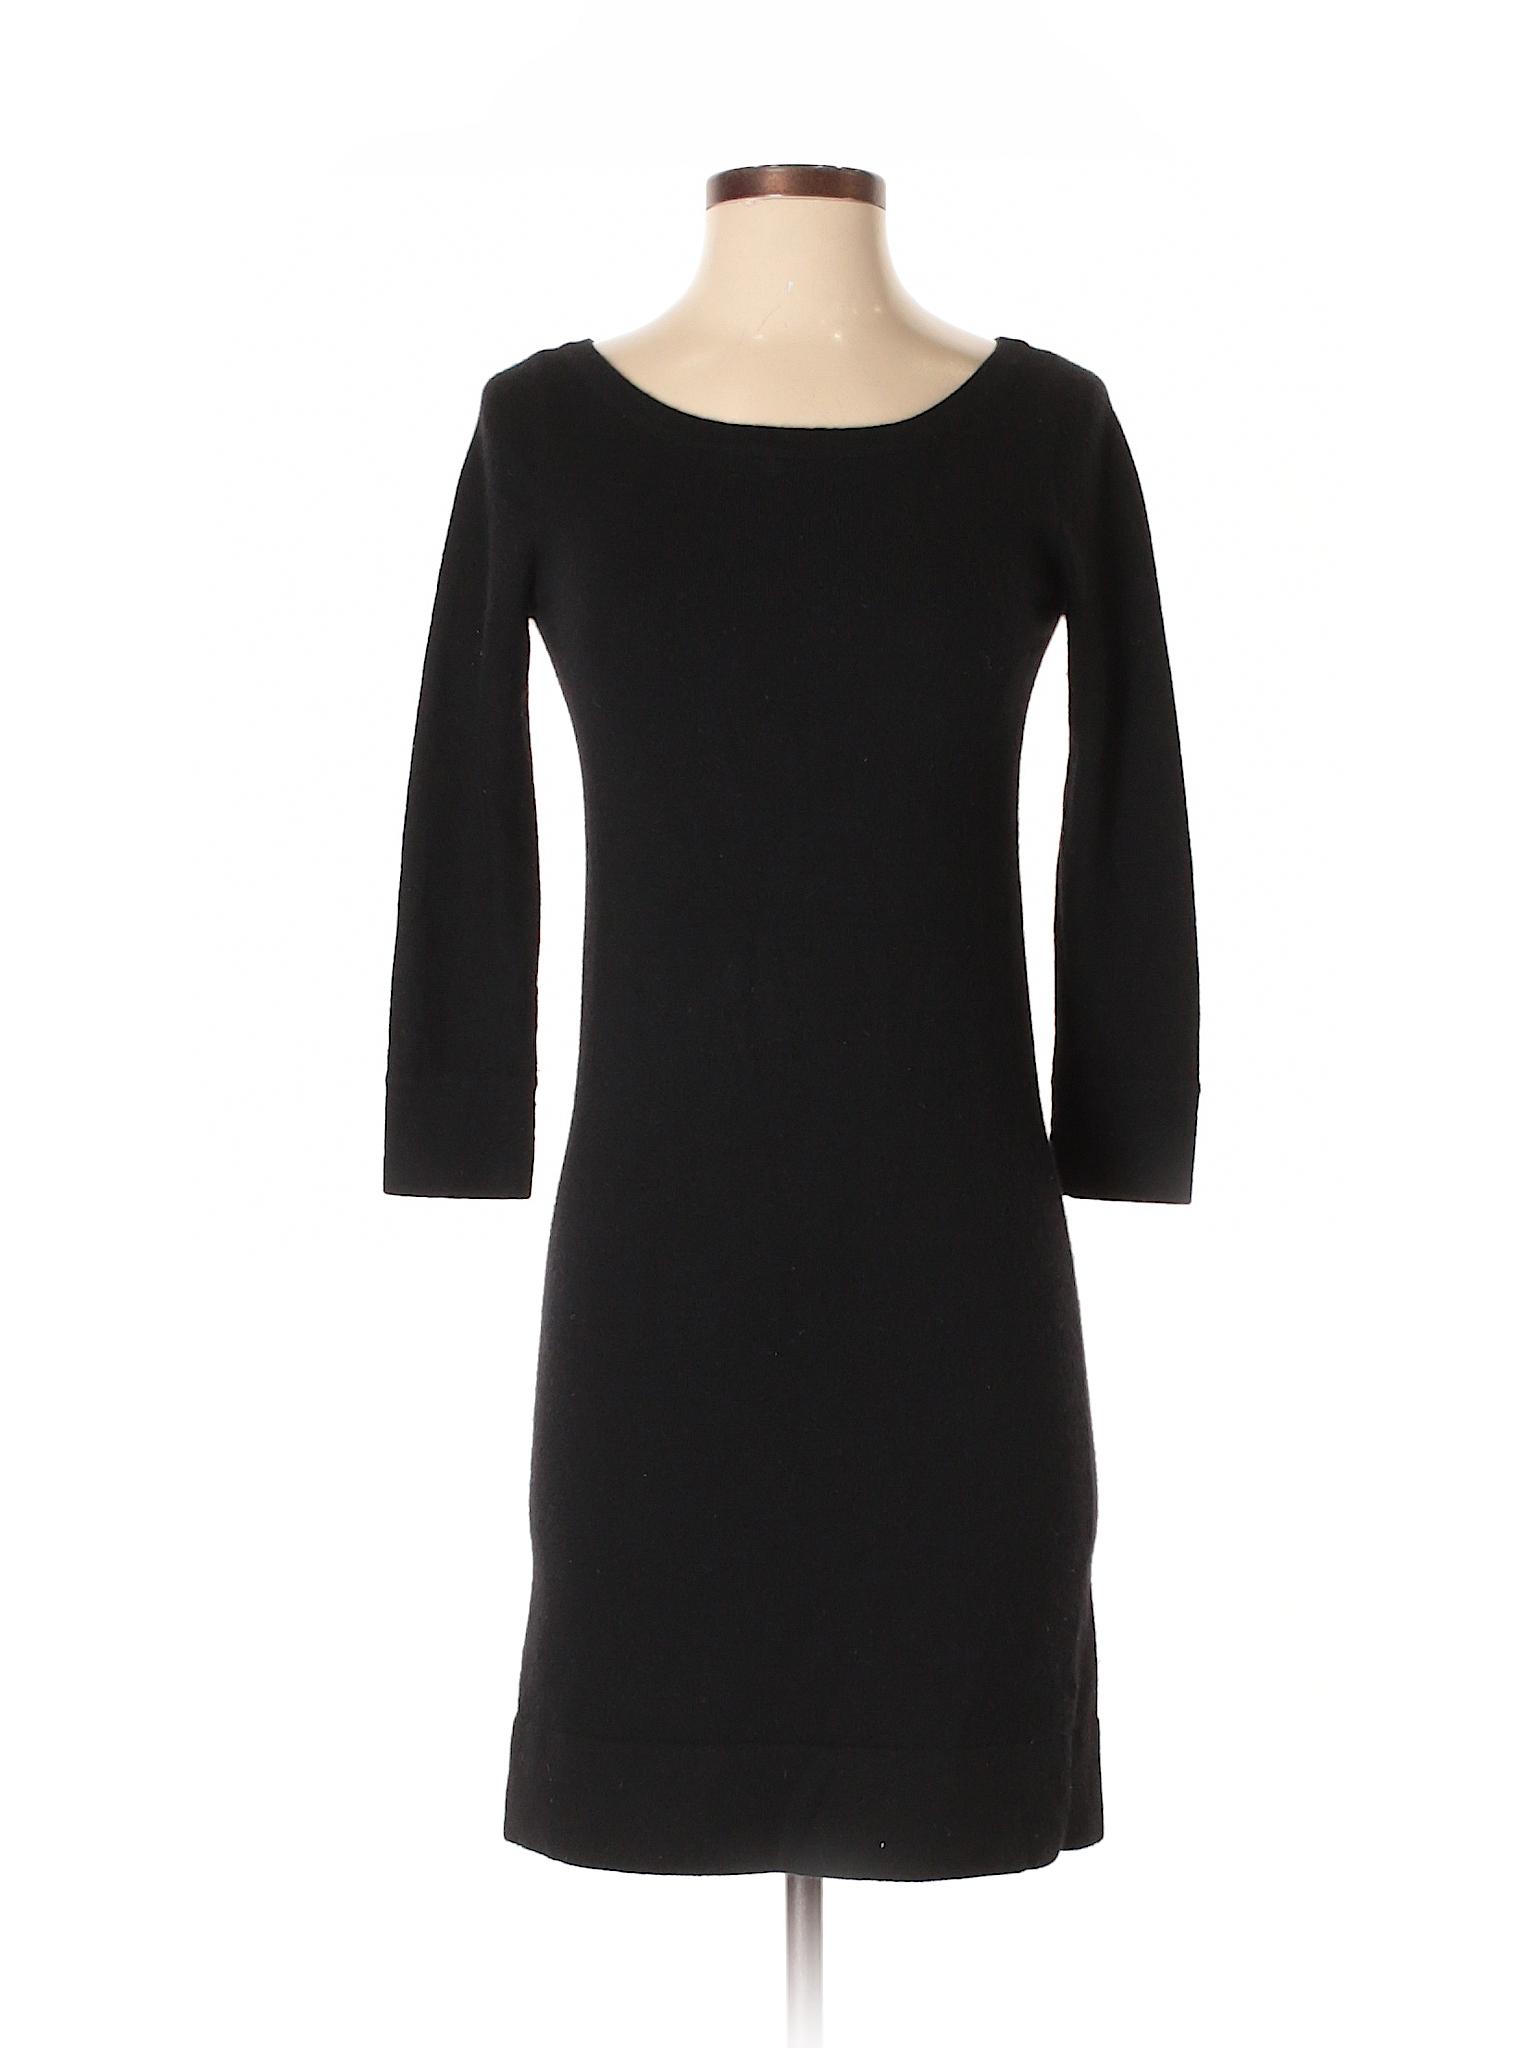 Boutique Casual Dress winter Dress Cache Boutique Cache Boutique Casual winter Cache Casual winter wzgqnzTaIY